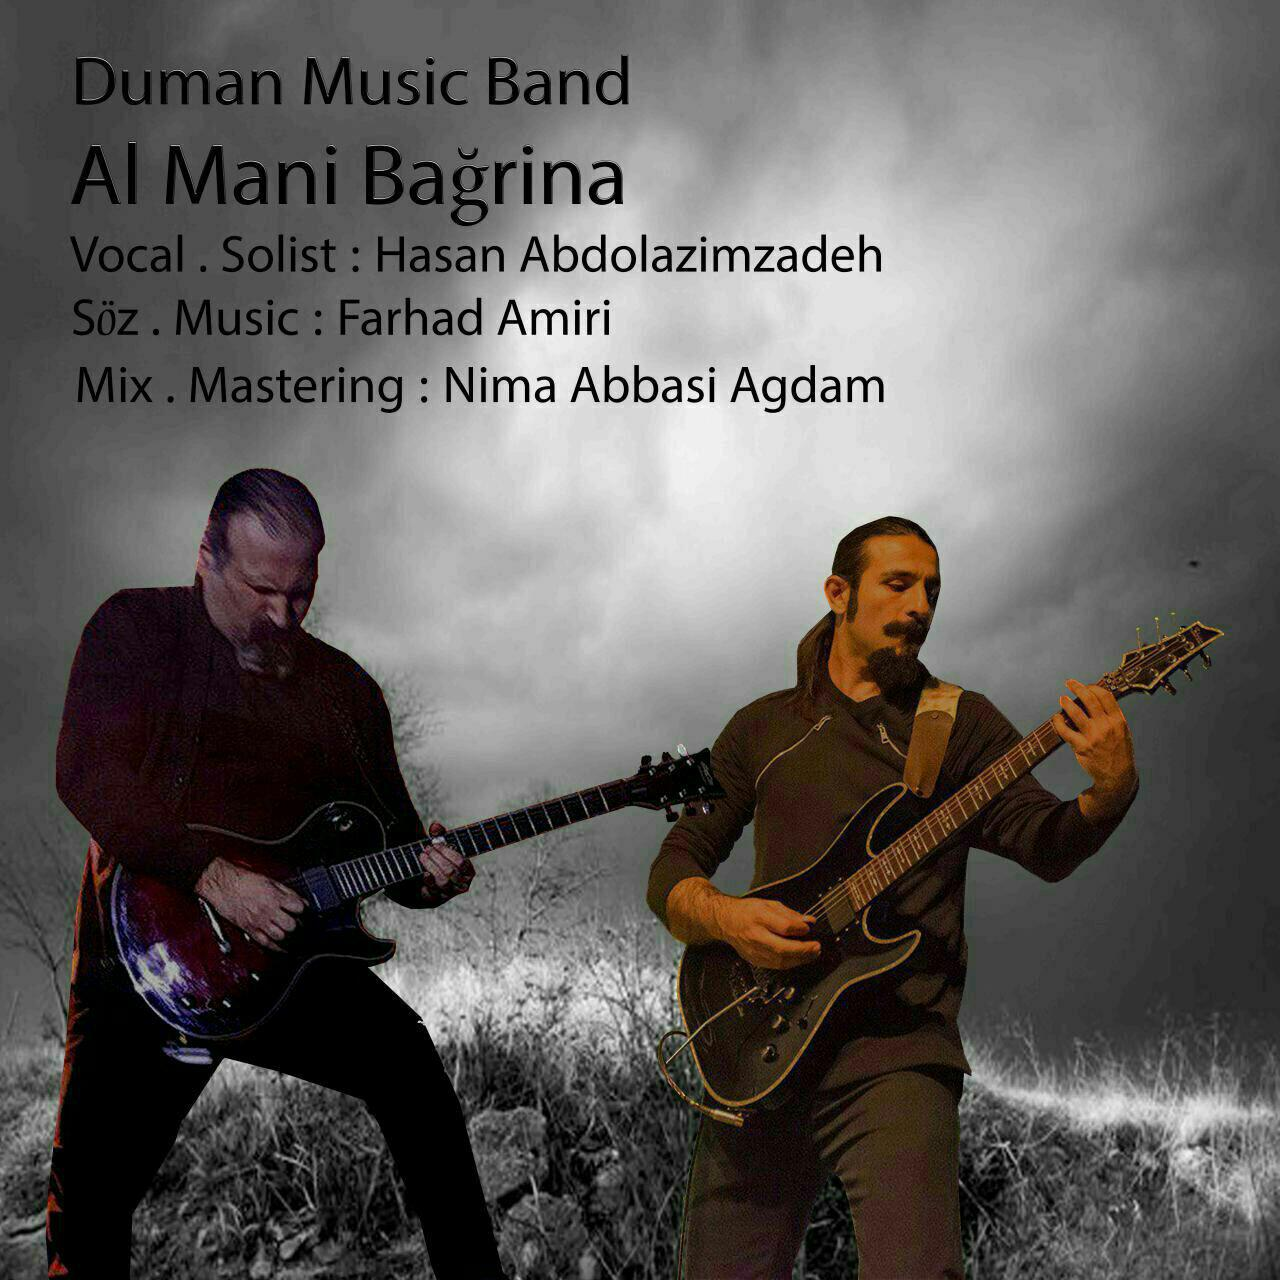 http://s8.picofile.com/file/8299833718/121Hasan_Abdolazimzadeh_Al_Mani_Bagrina.jpg